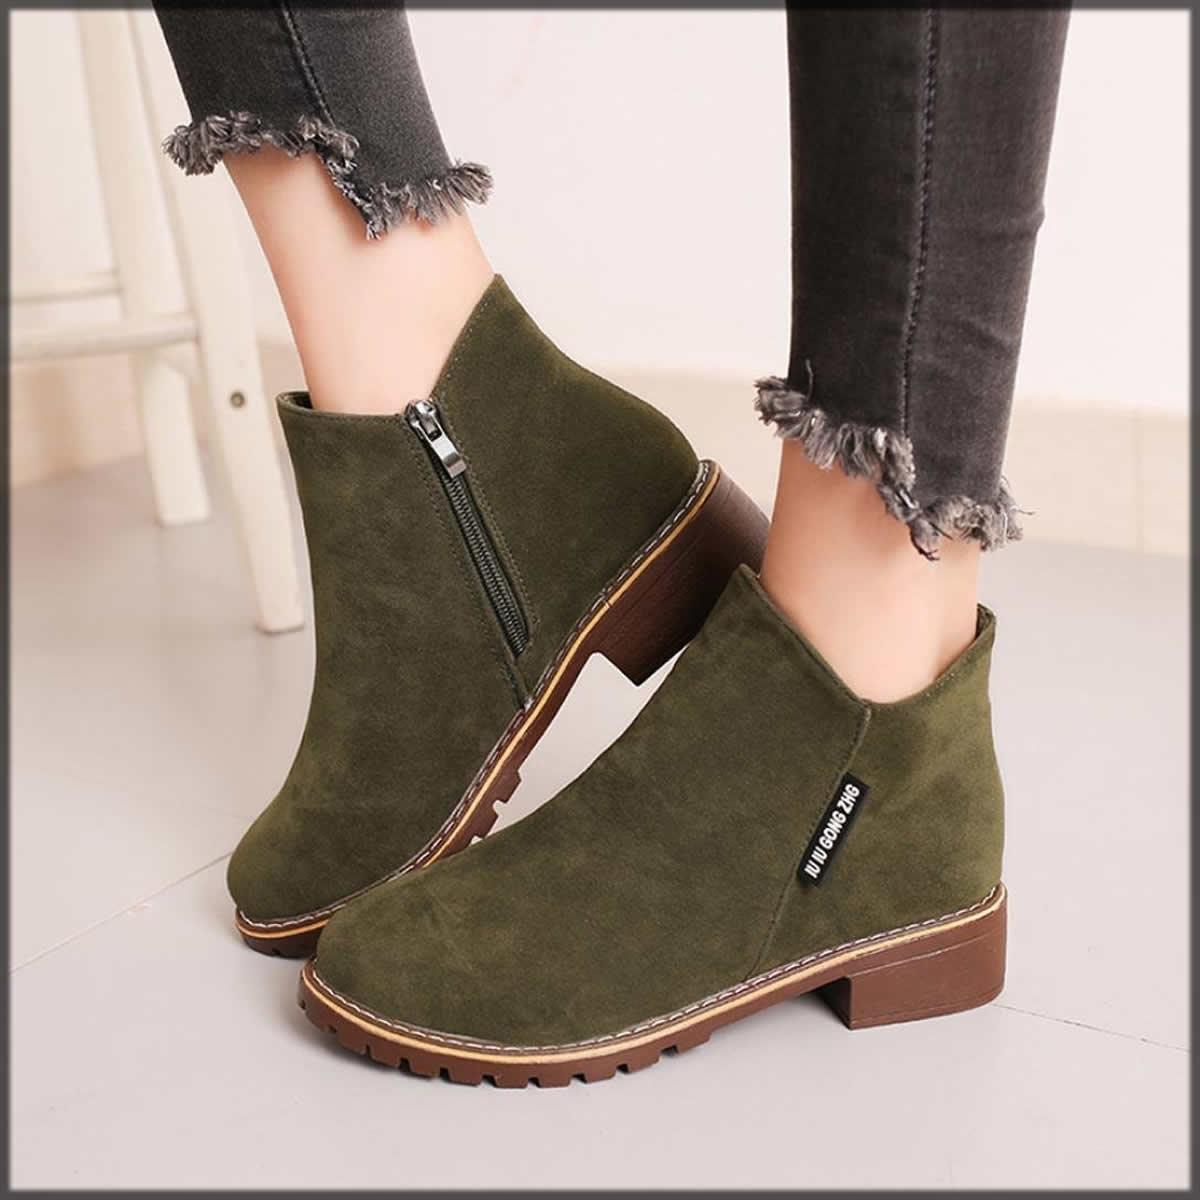 green hemlock shoes